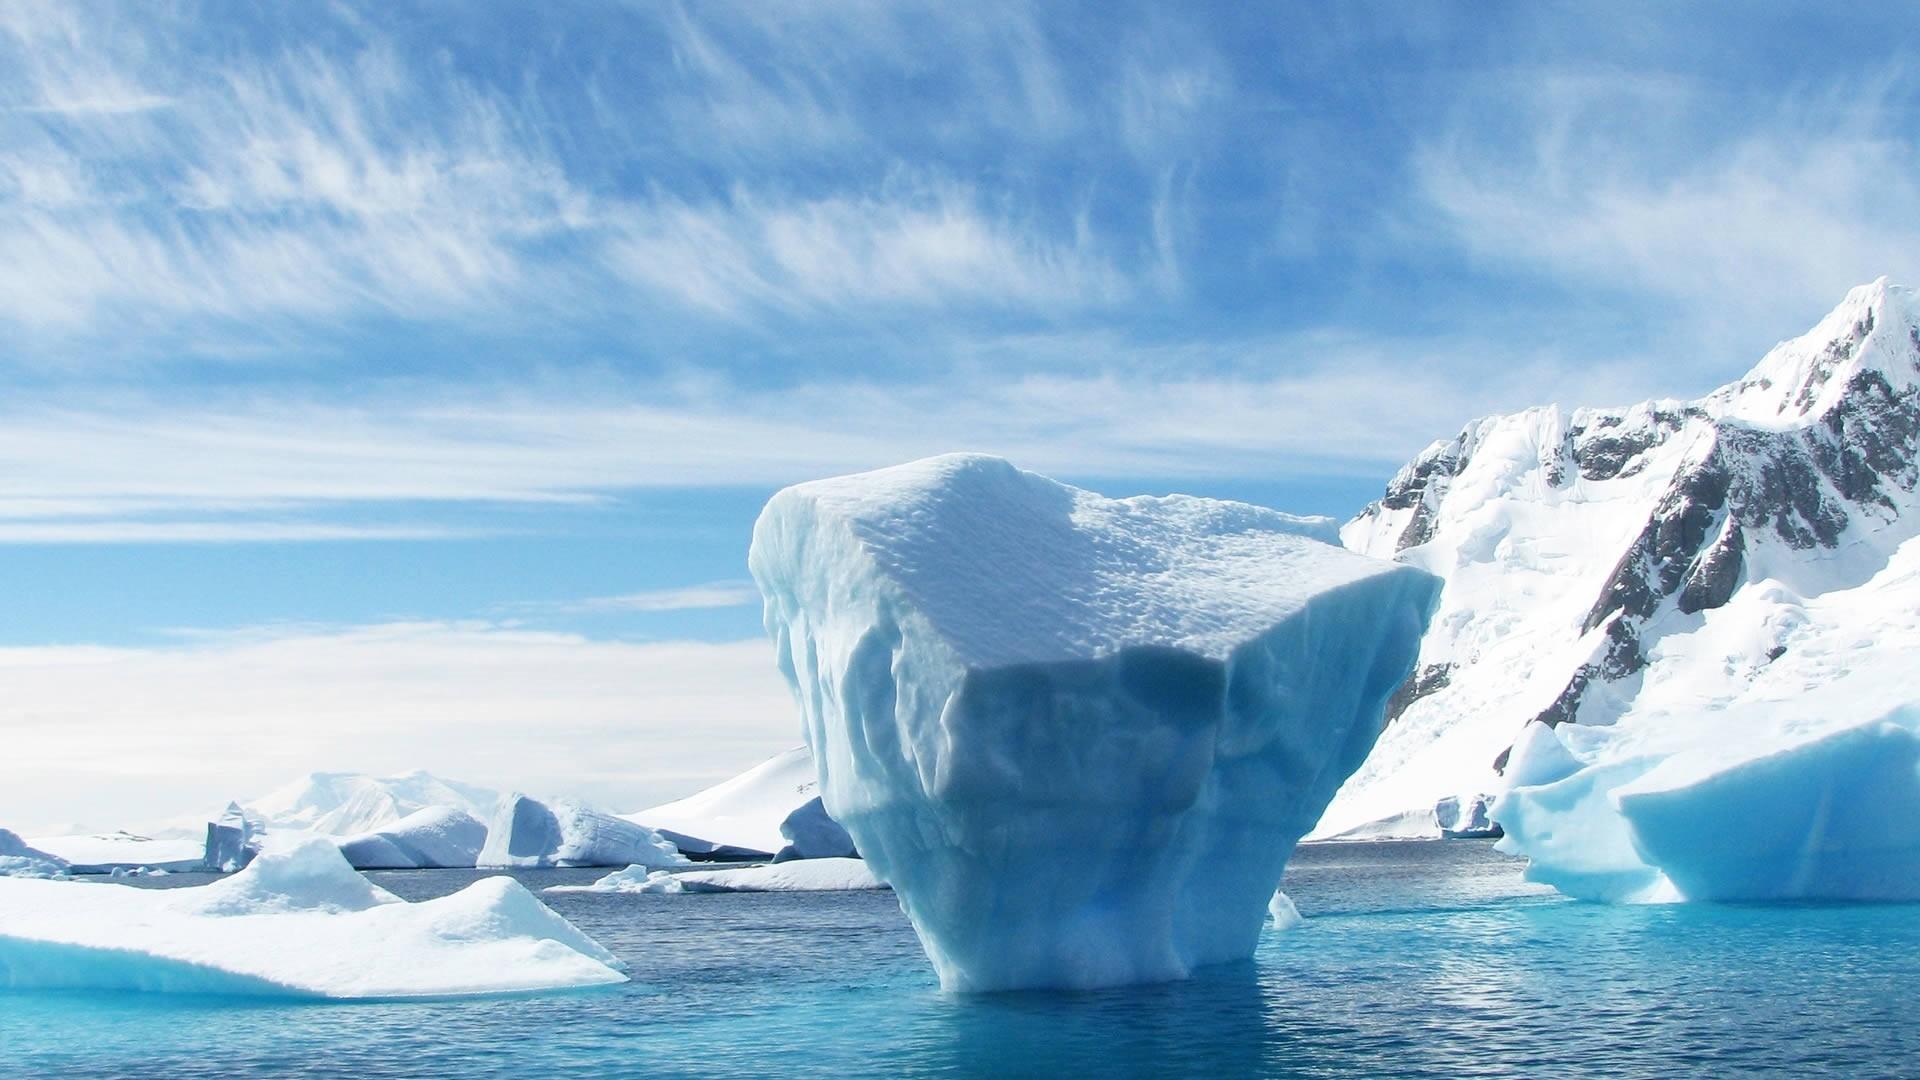 Antarctica Wallpaper Image